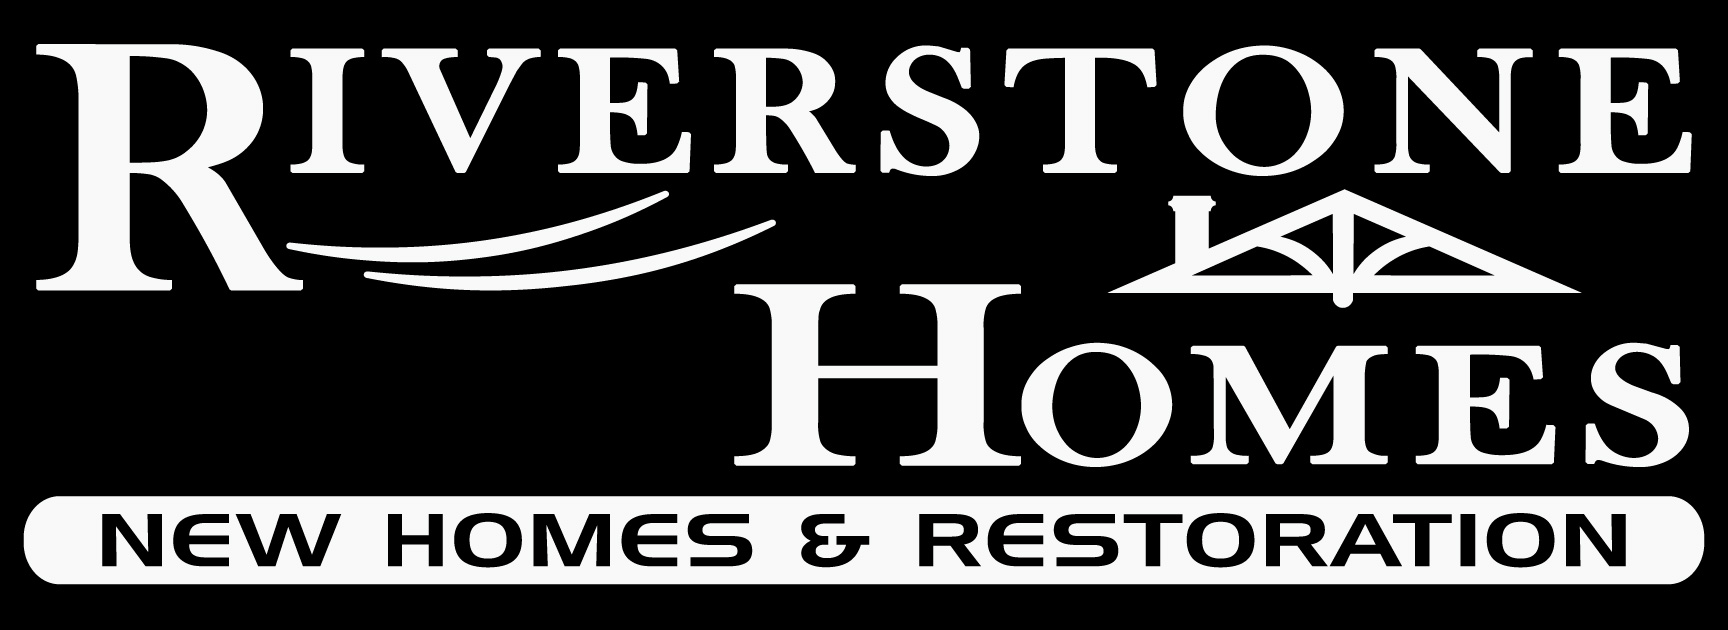 Riverstone Homes